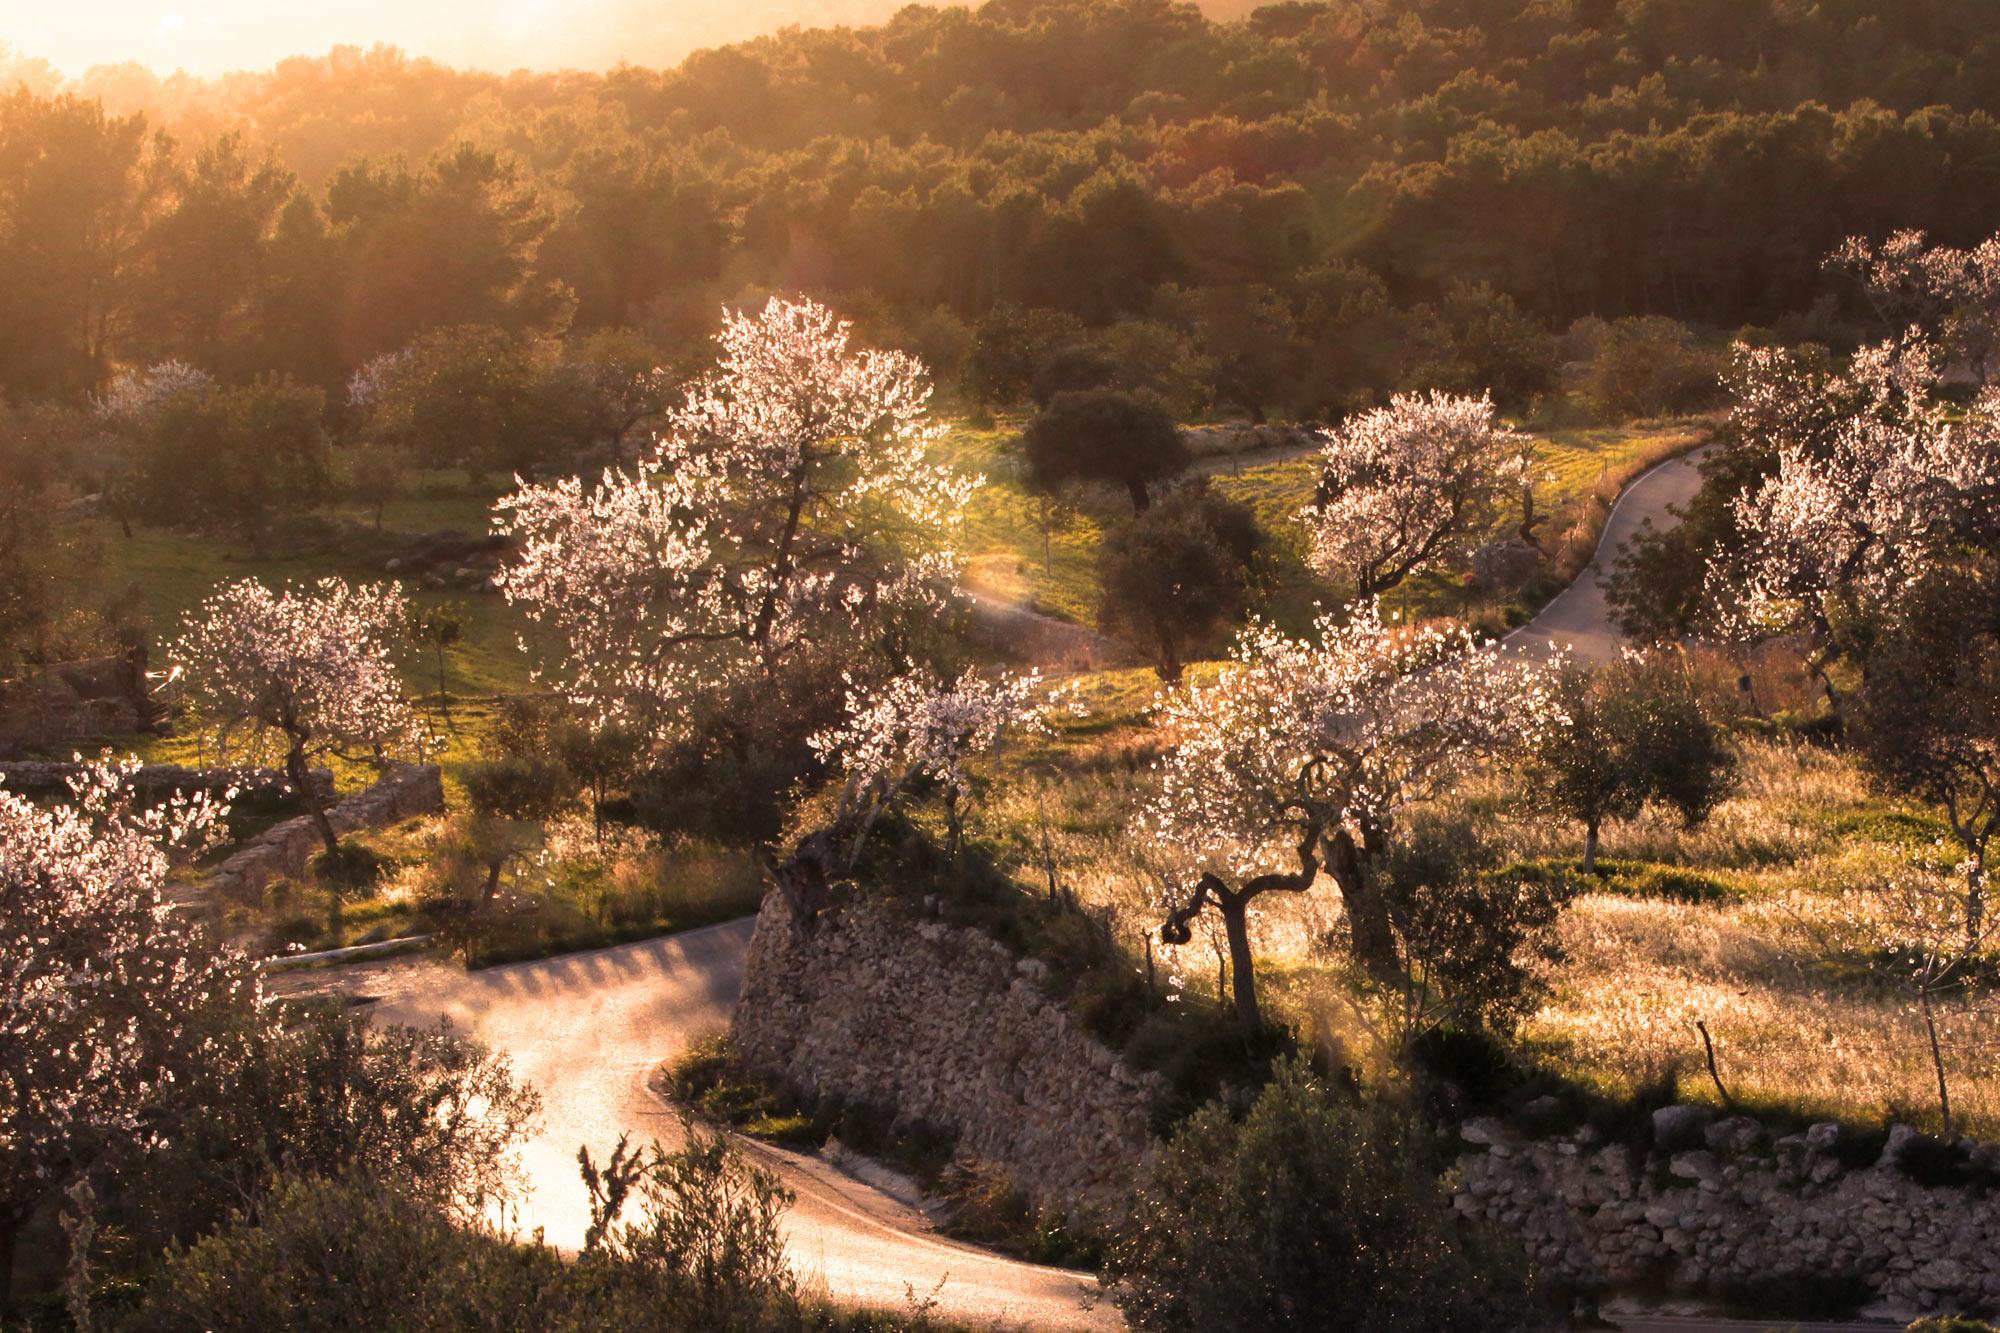 blossom on trees